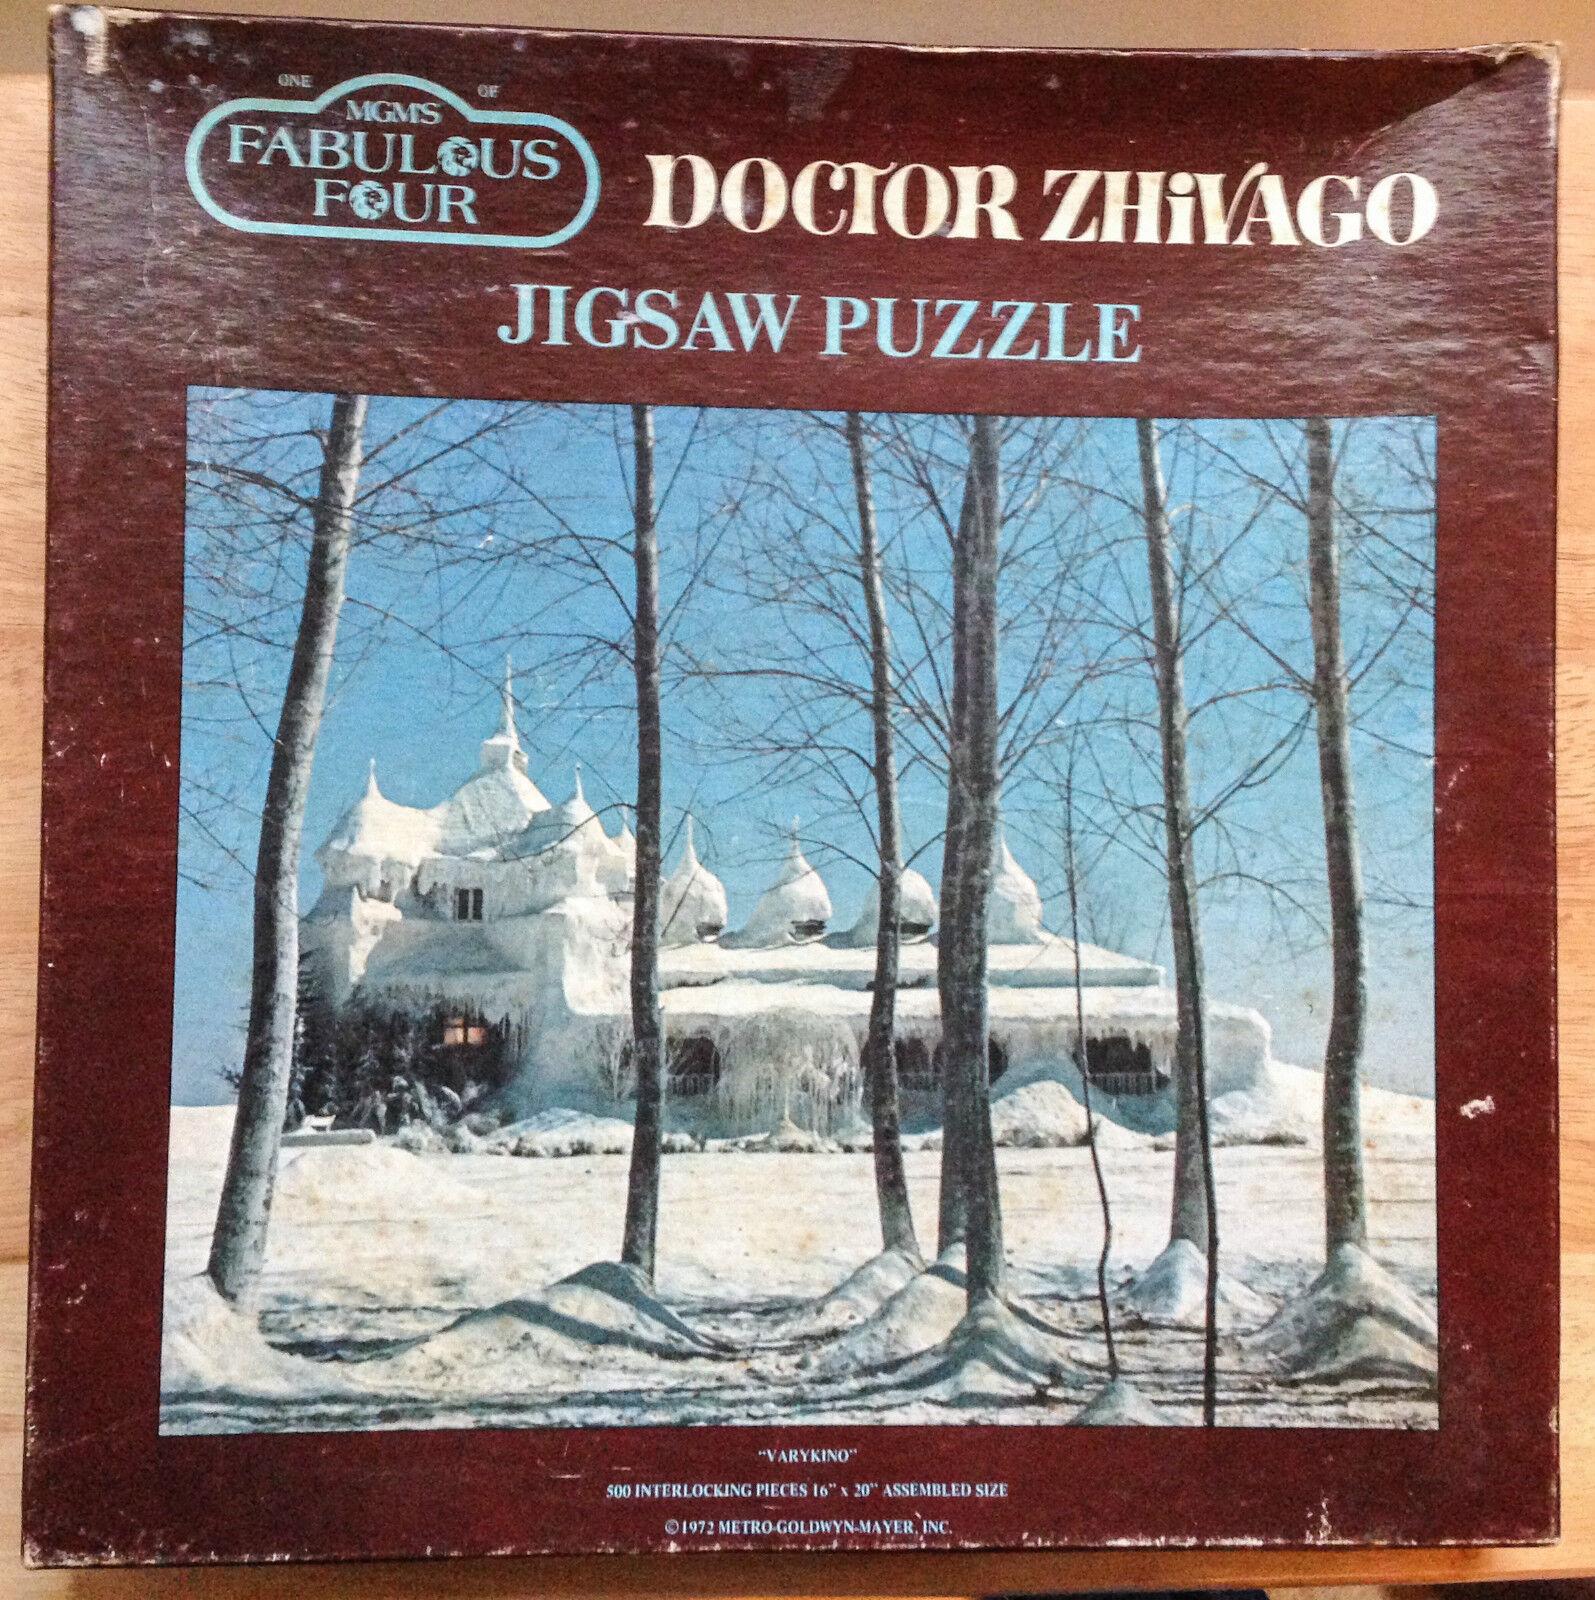 1972 Docteur Jivago Puzzle, Varykino, MGM 'Fabulous quatre séries, 500 pièces